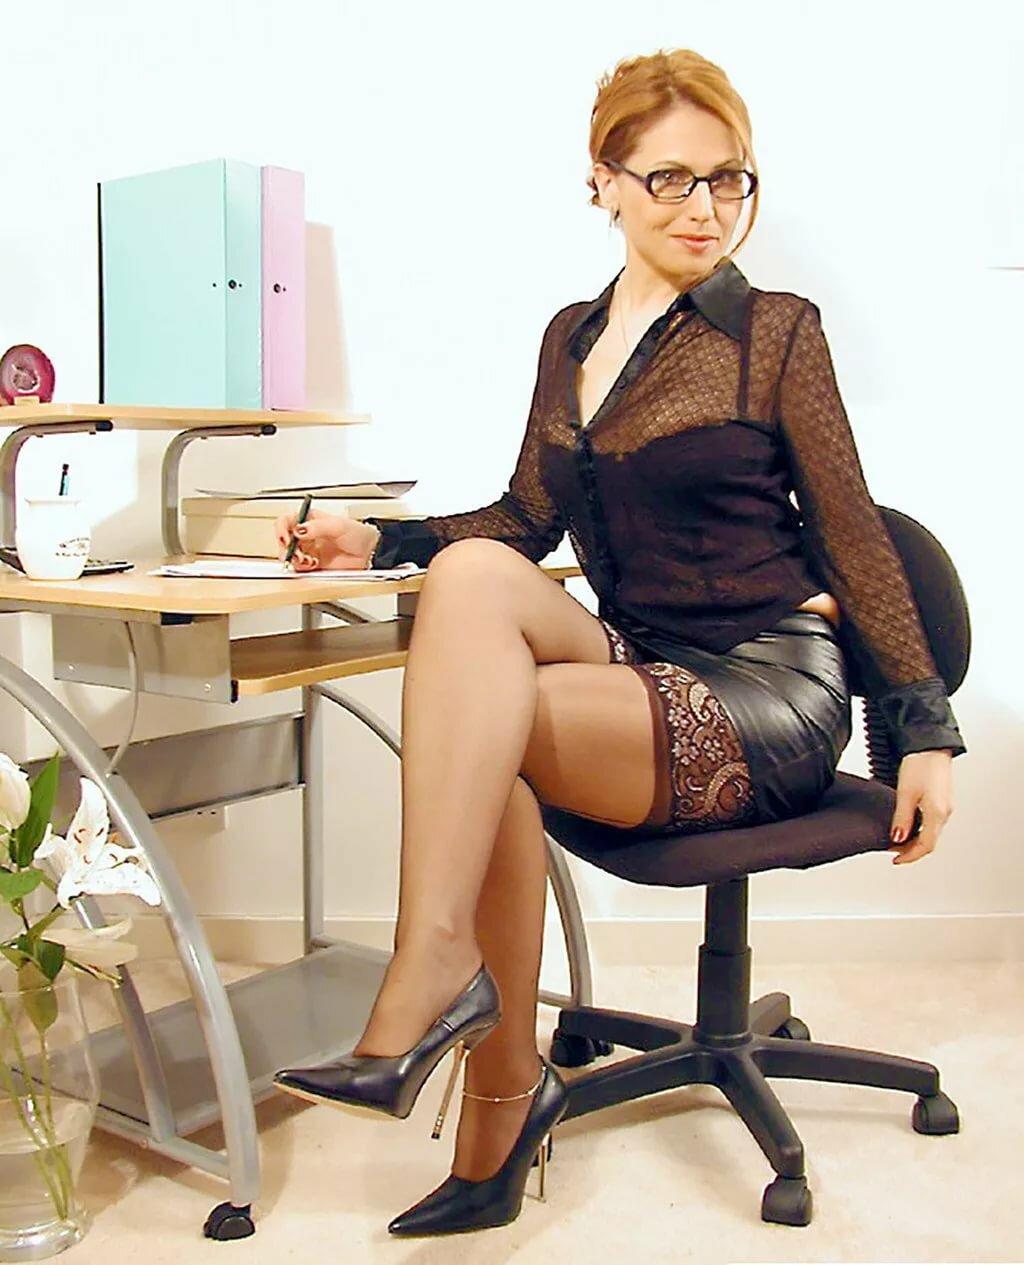 Фото зрелой в офисе, вип девушки краснодар